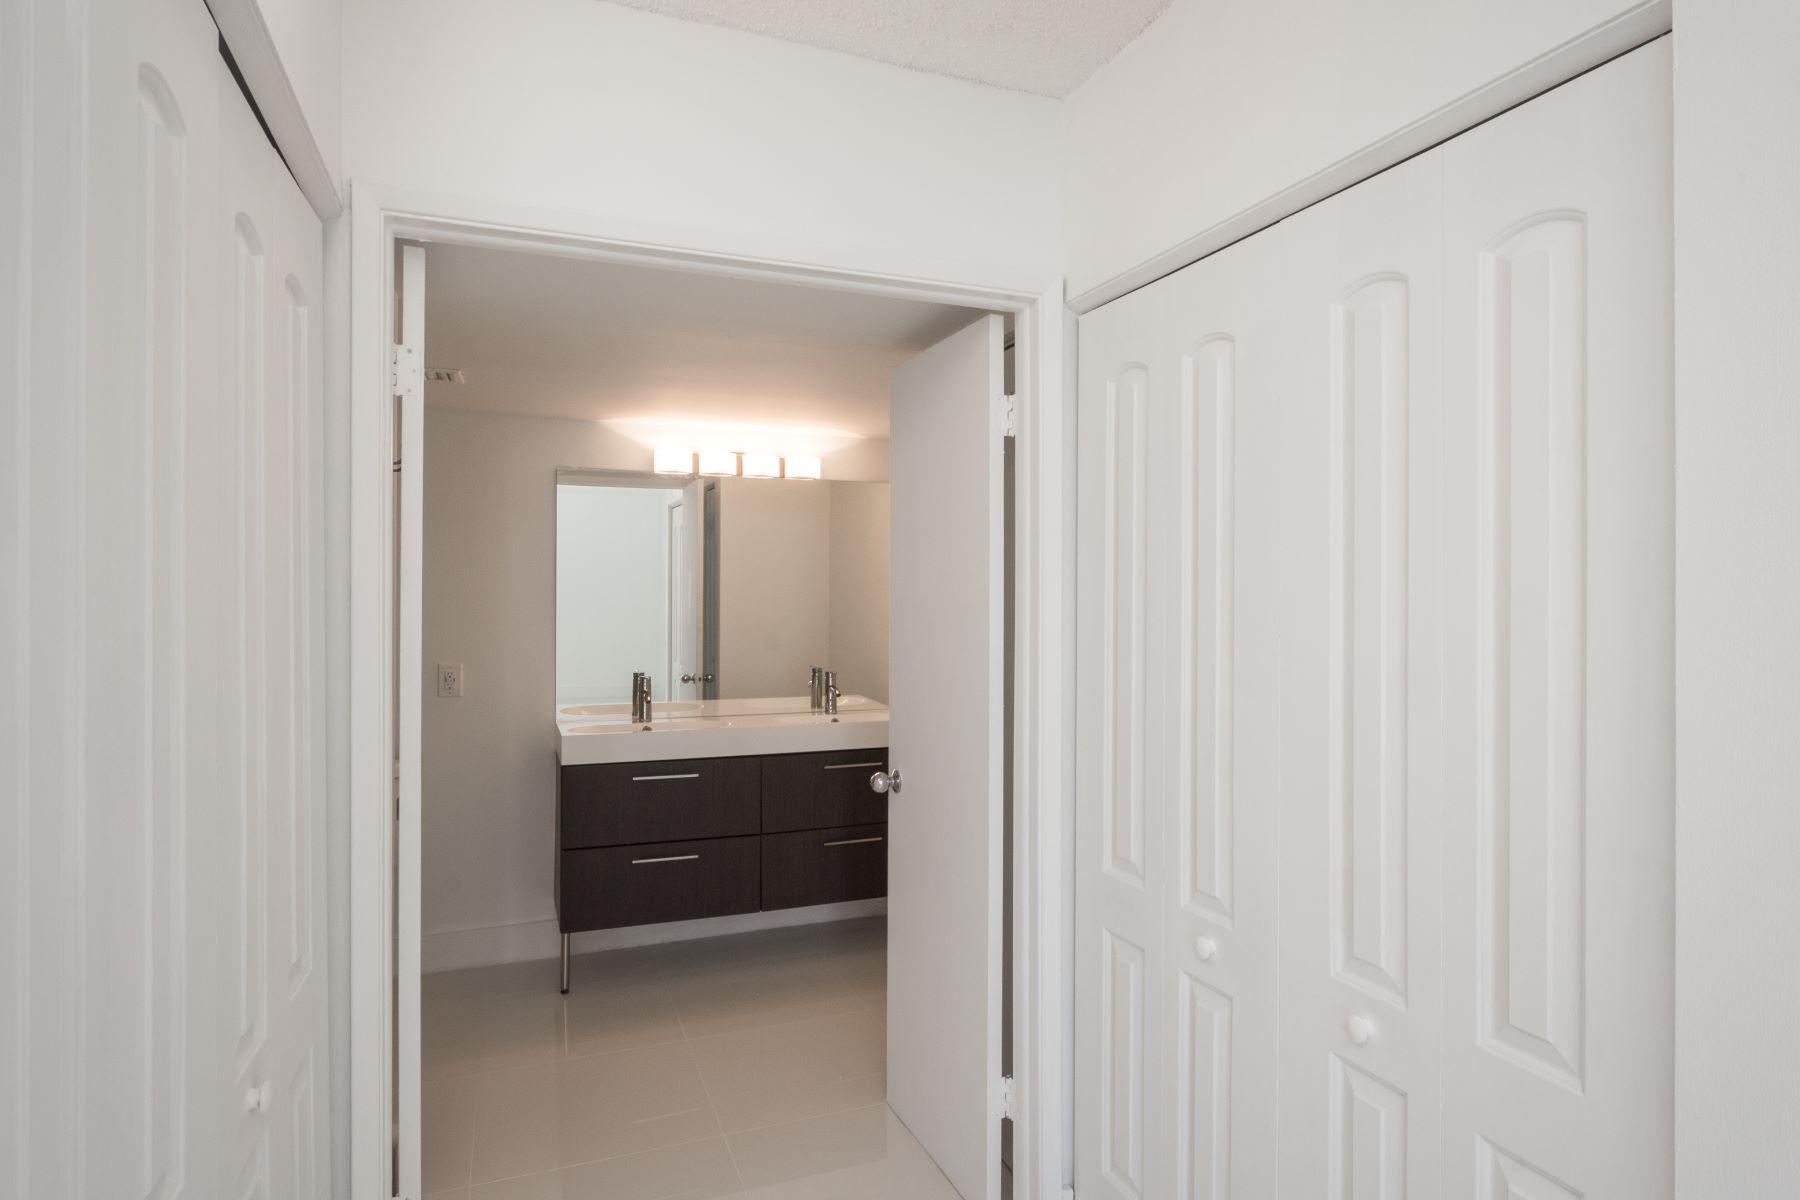 Additional photo for property listing at 3300 Ne 191st St 3300 Ne 191st St 809 Aventura, Florida 33180 United States